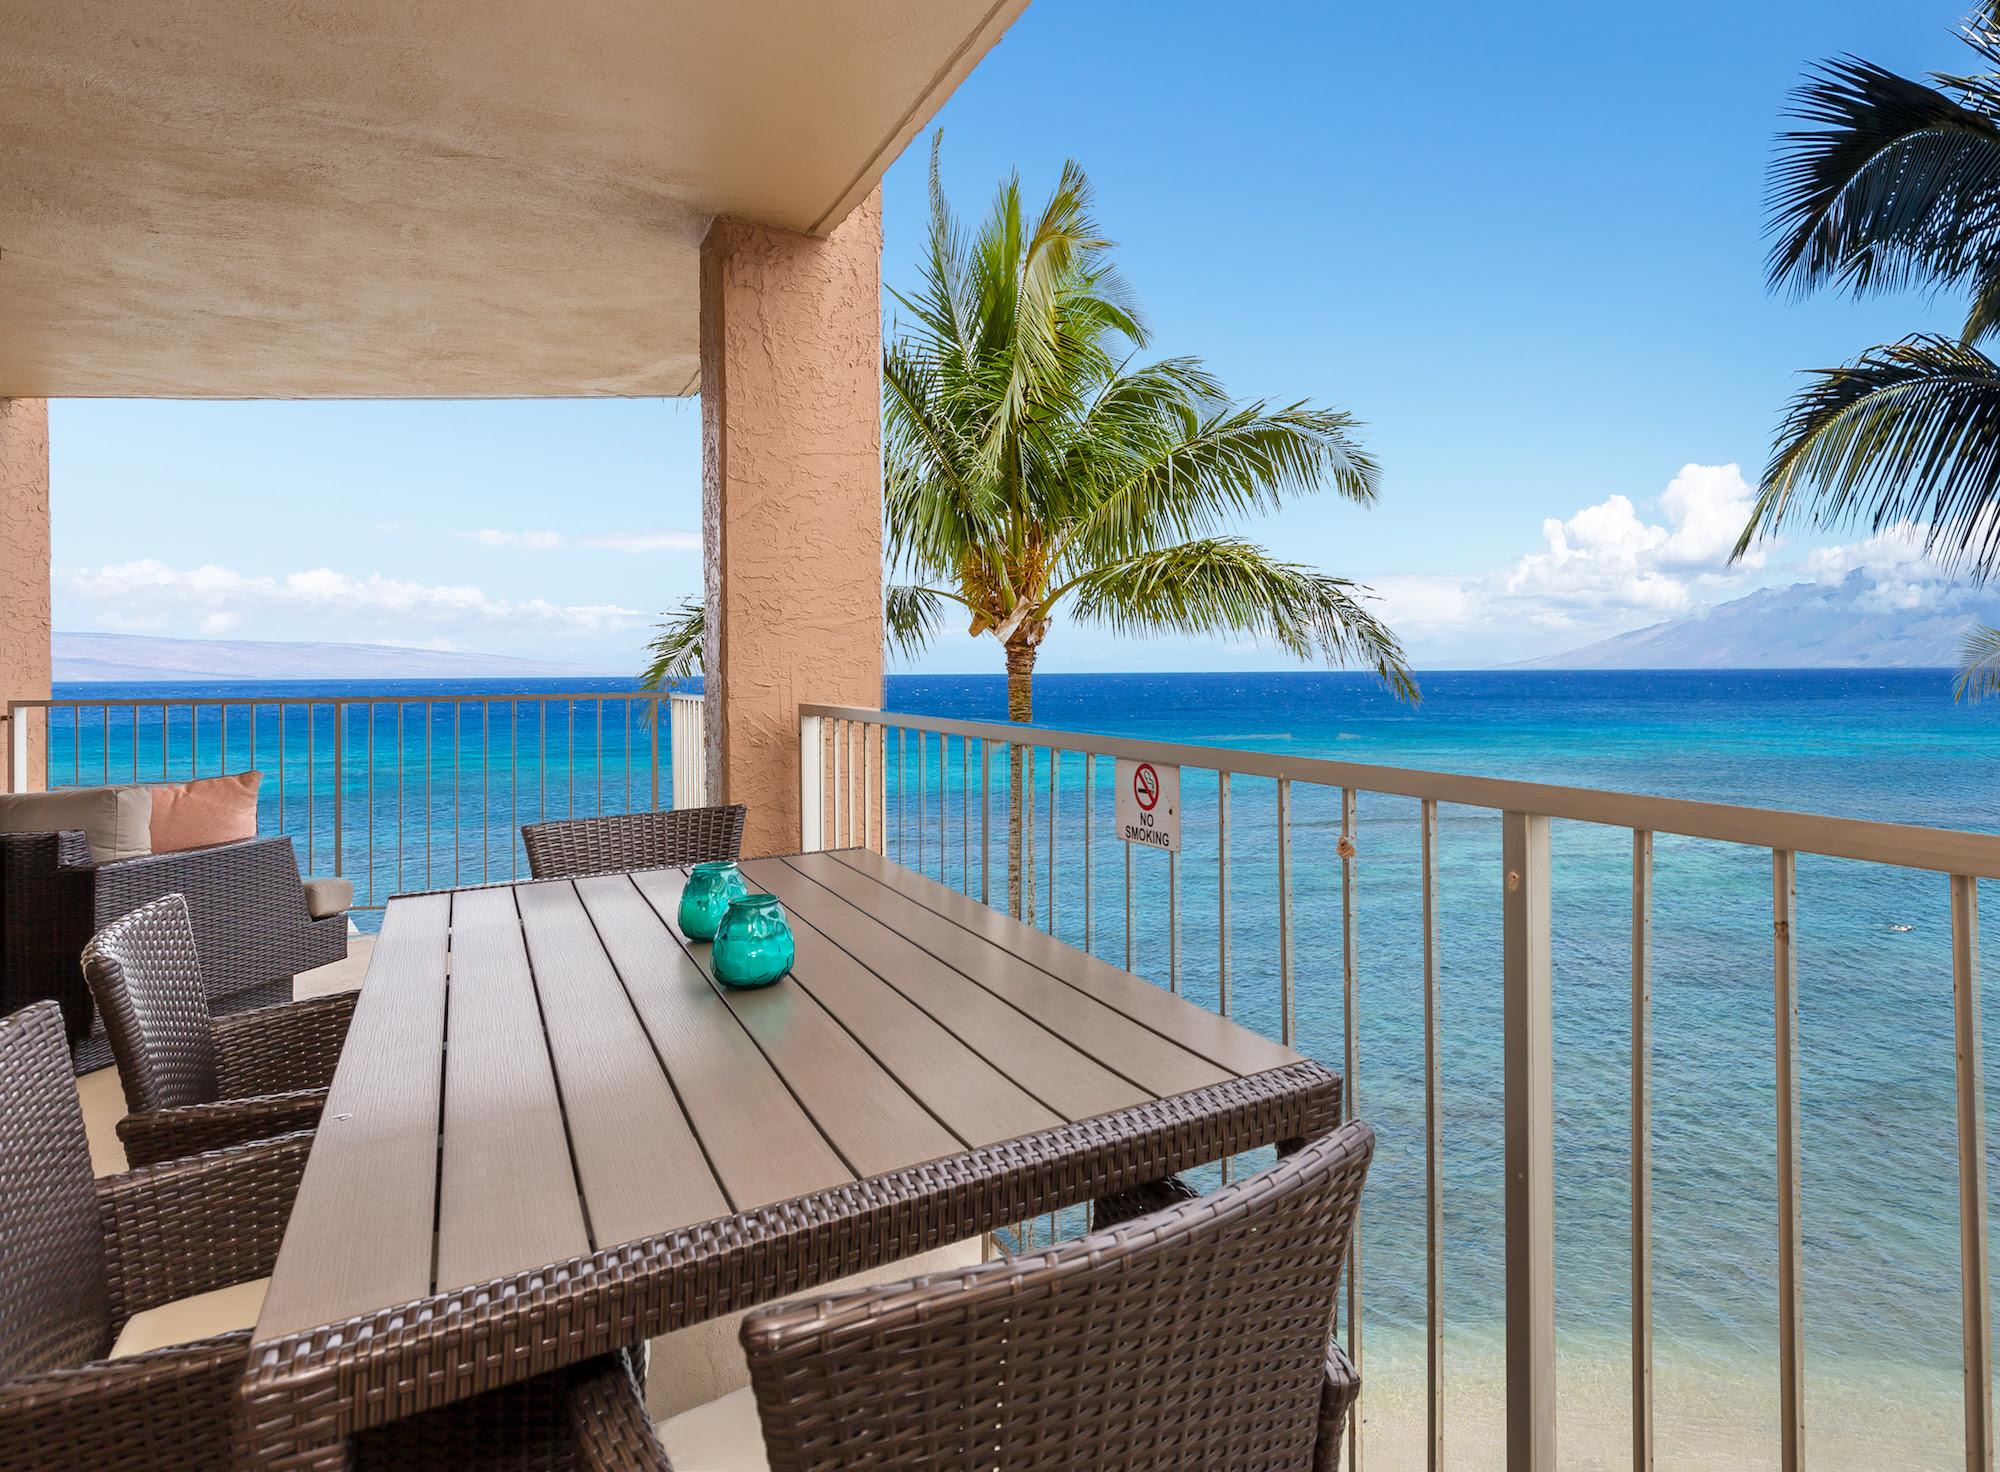 Maui Accommodations Guide  Royal Kahana 510  Vacation Condo